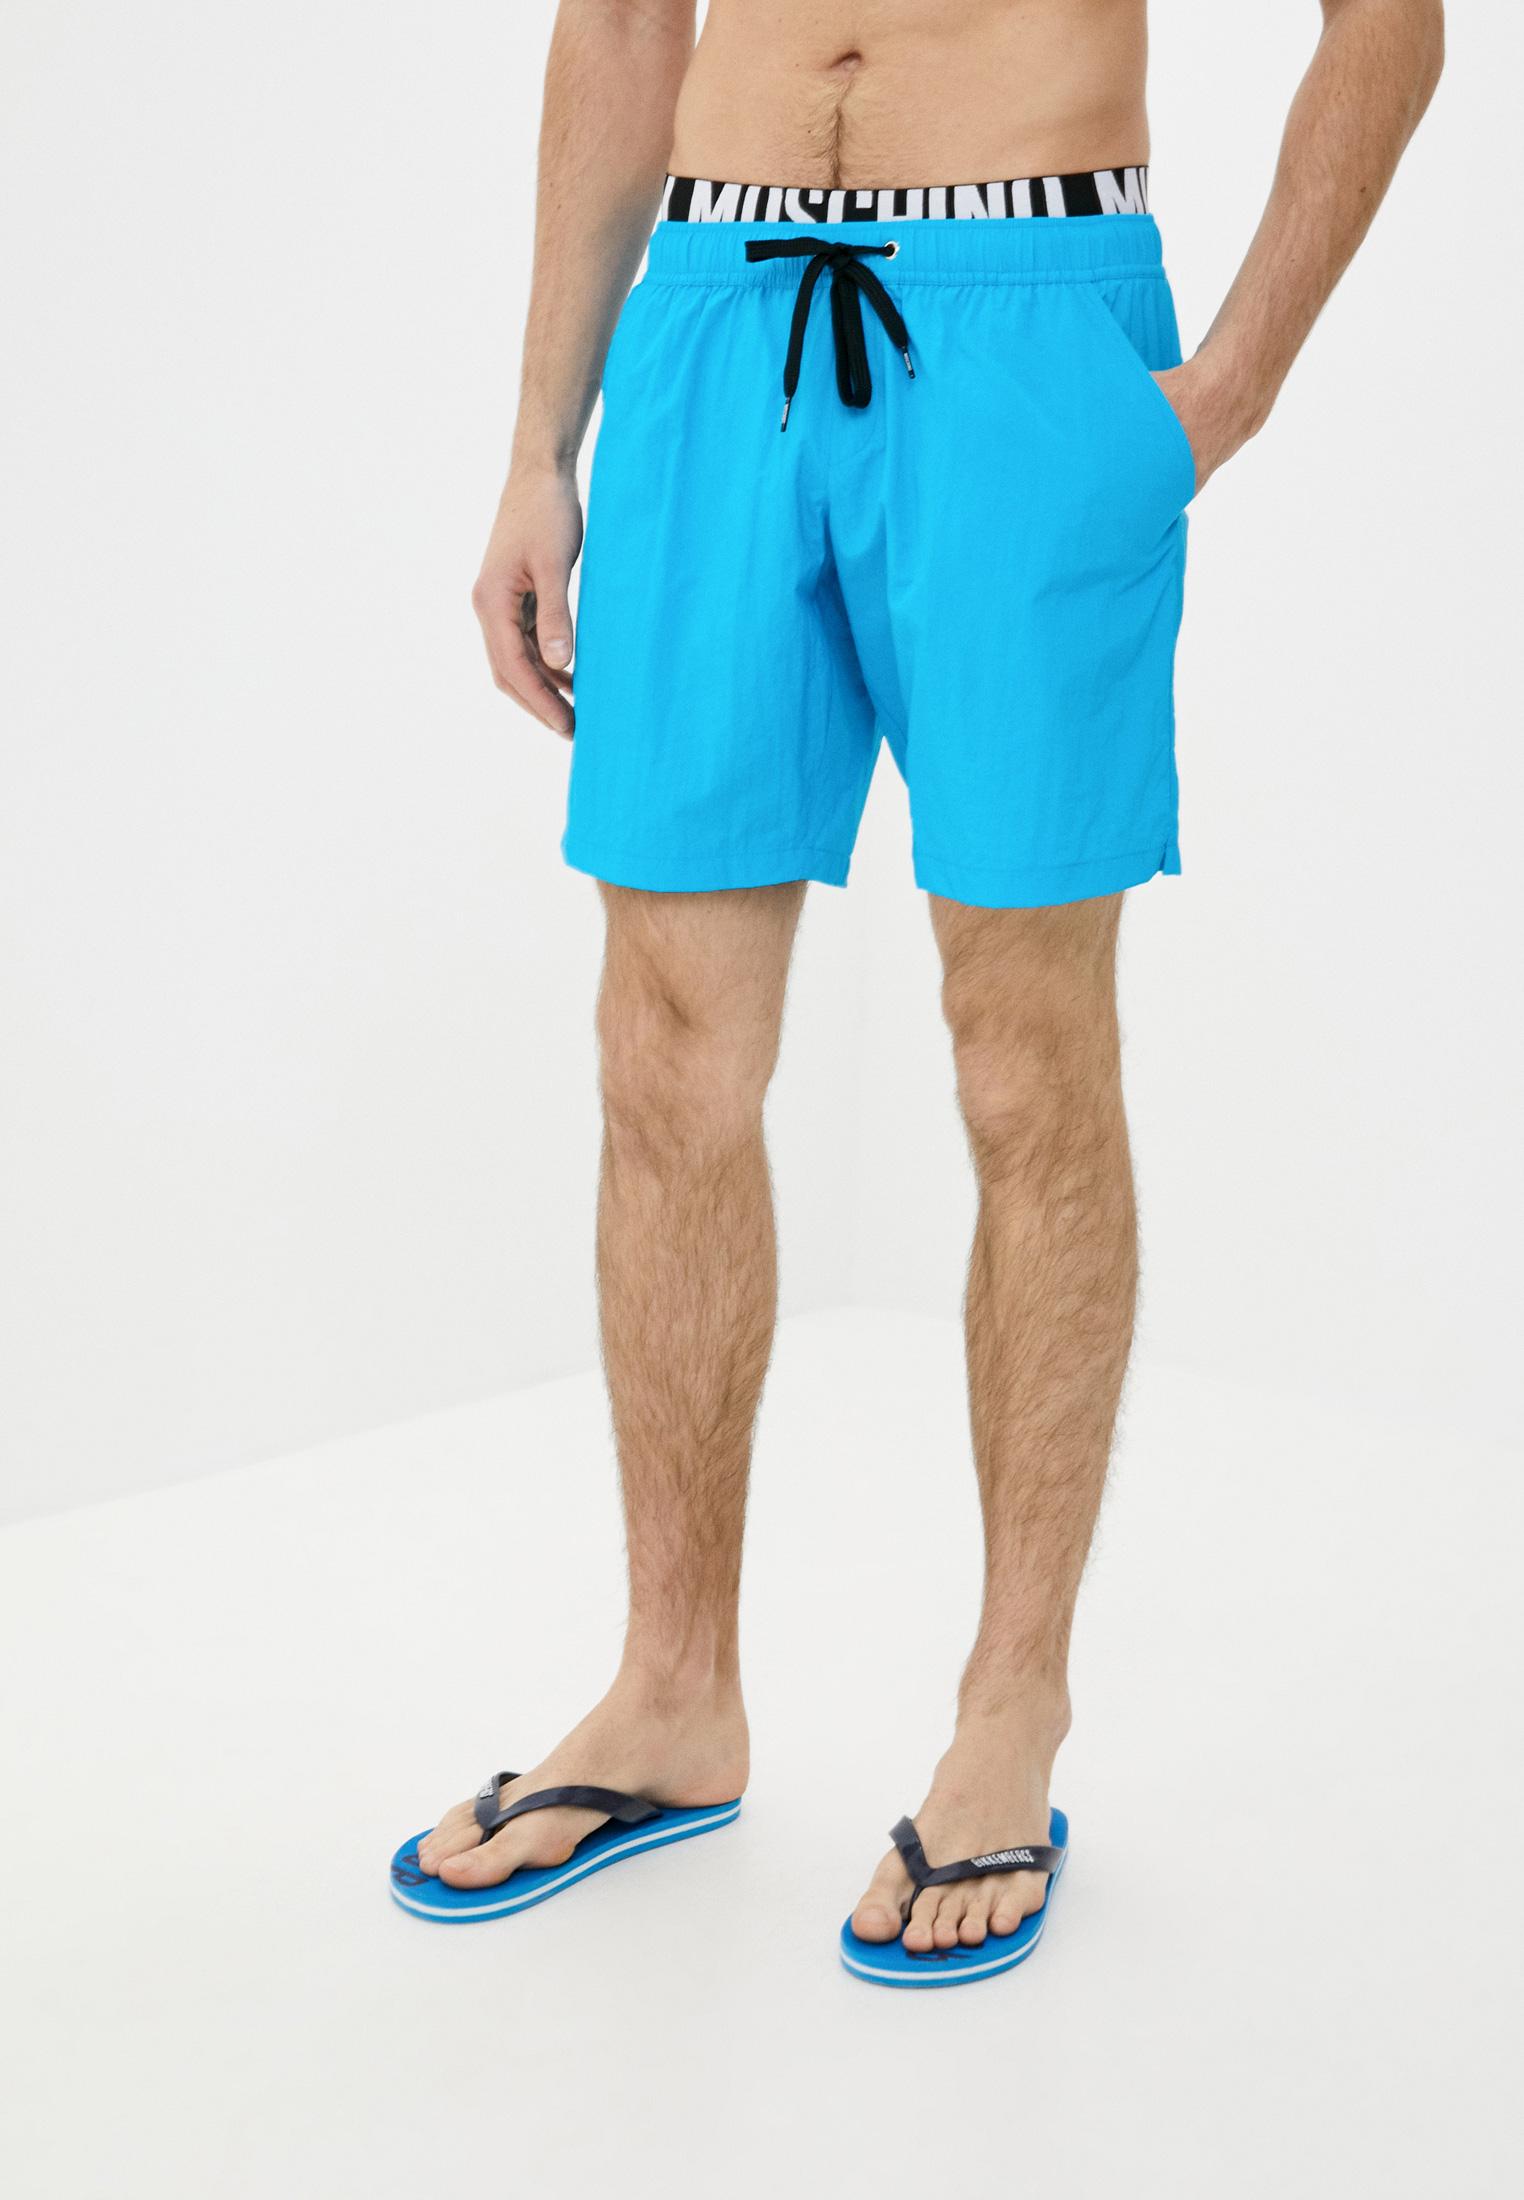 Мужские шорты для плавания Moschino swim 6118 5439